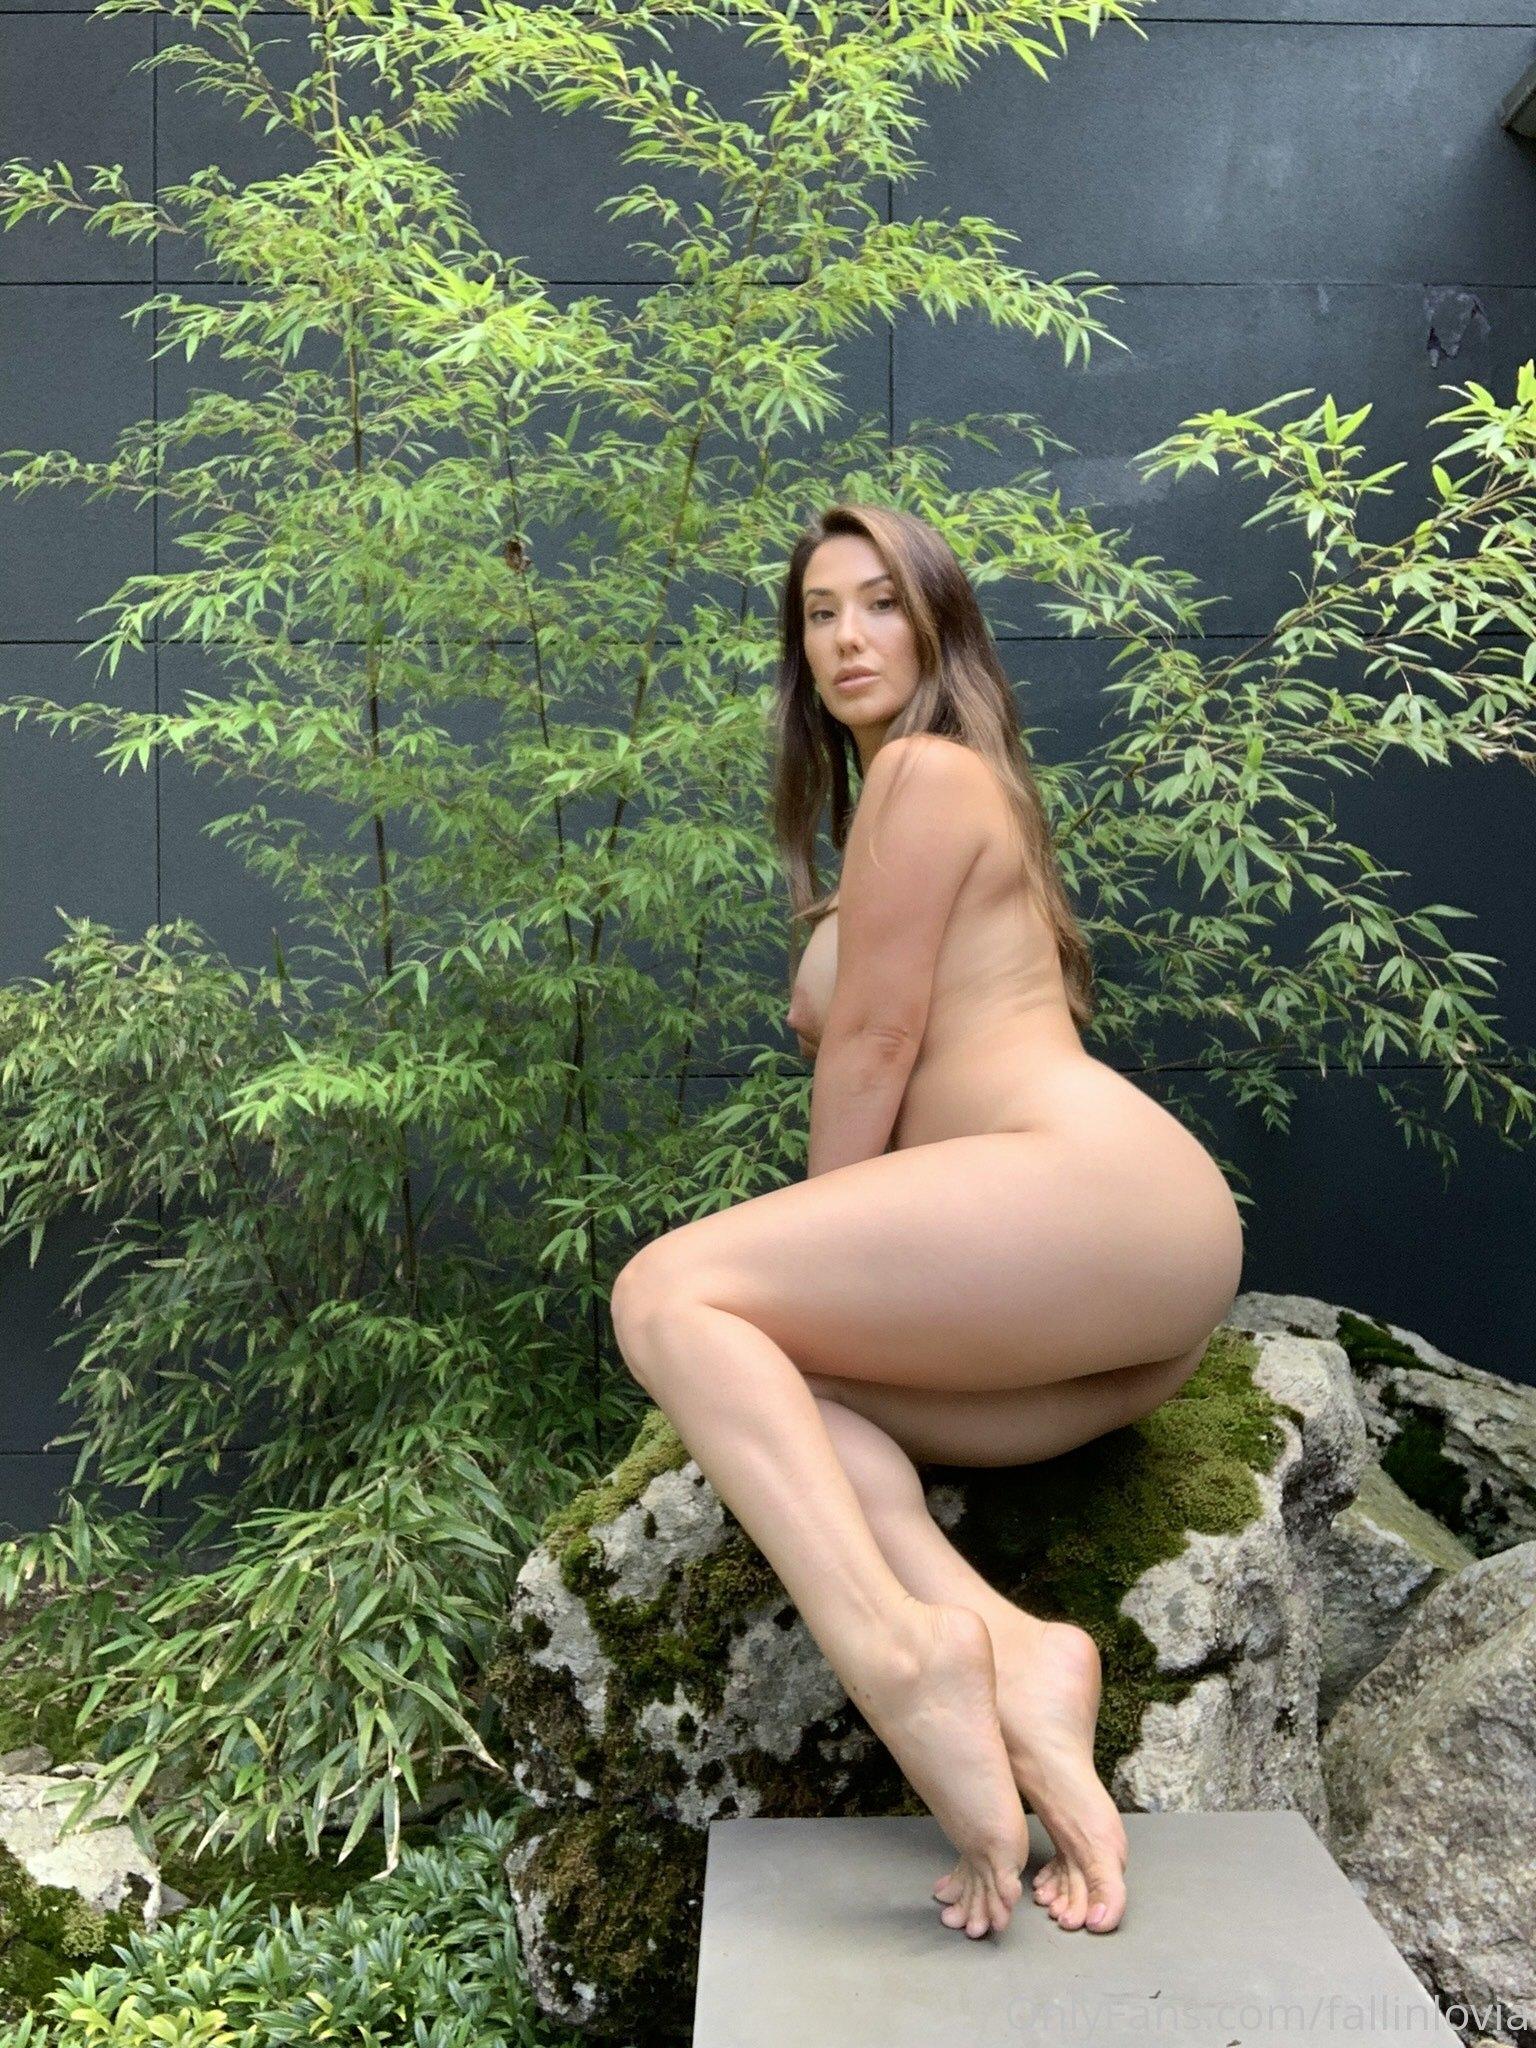 Eva Lovia, Fallinlovia, Onlyfans 0066